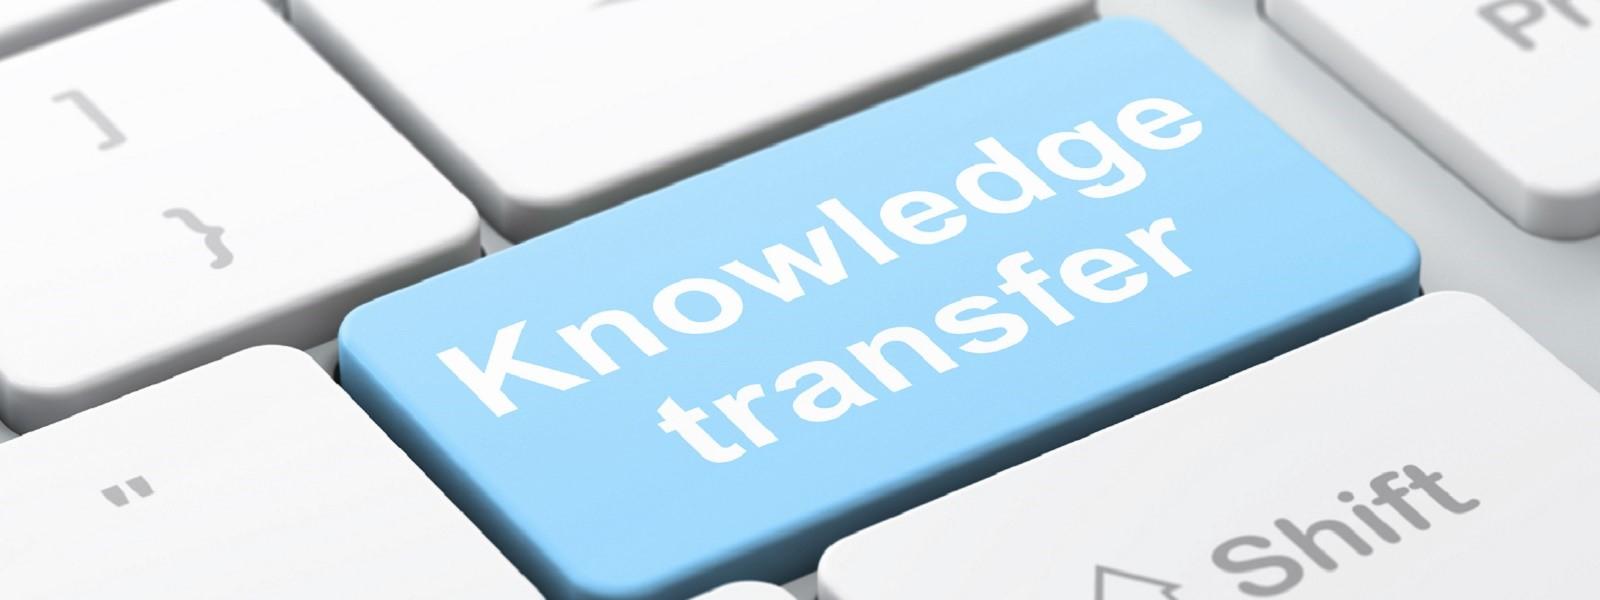 knowledge_transfer_kt_proton